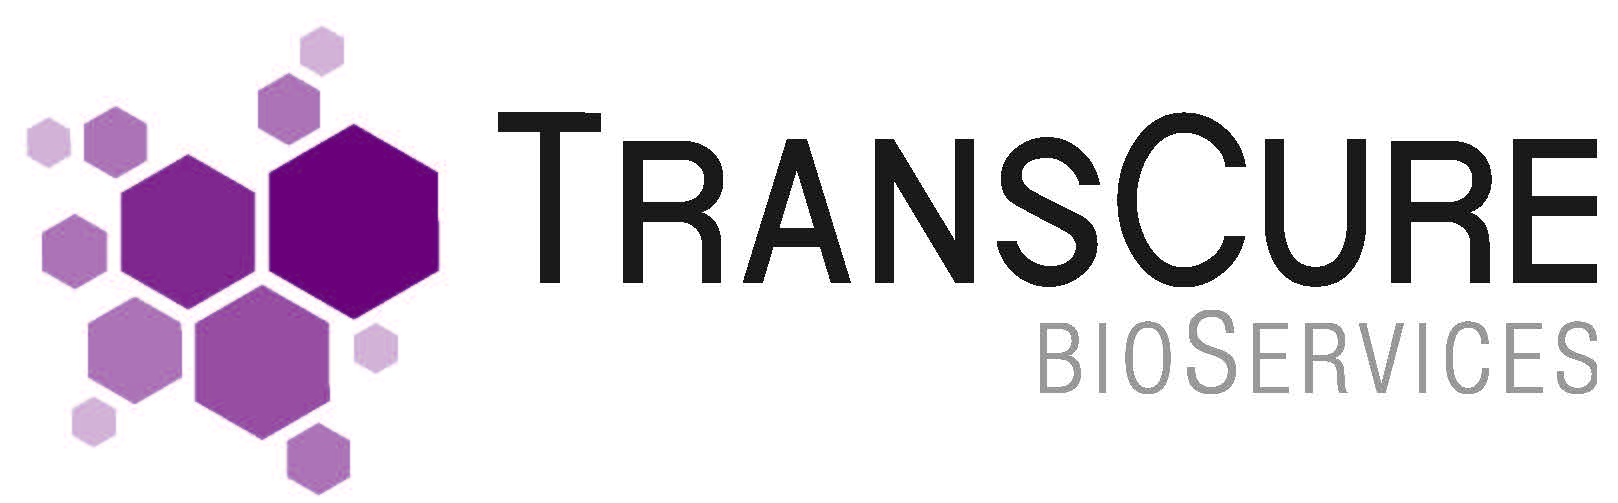 Transcure Bio Services